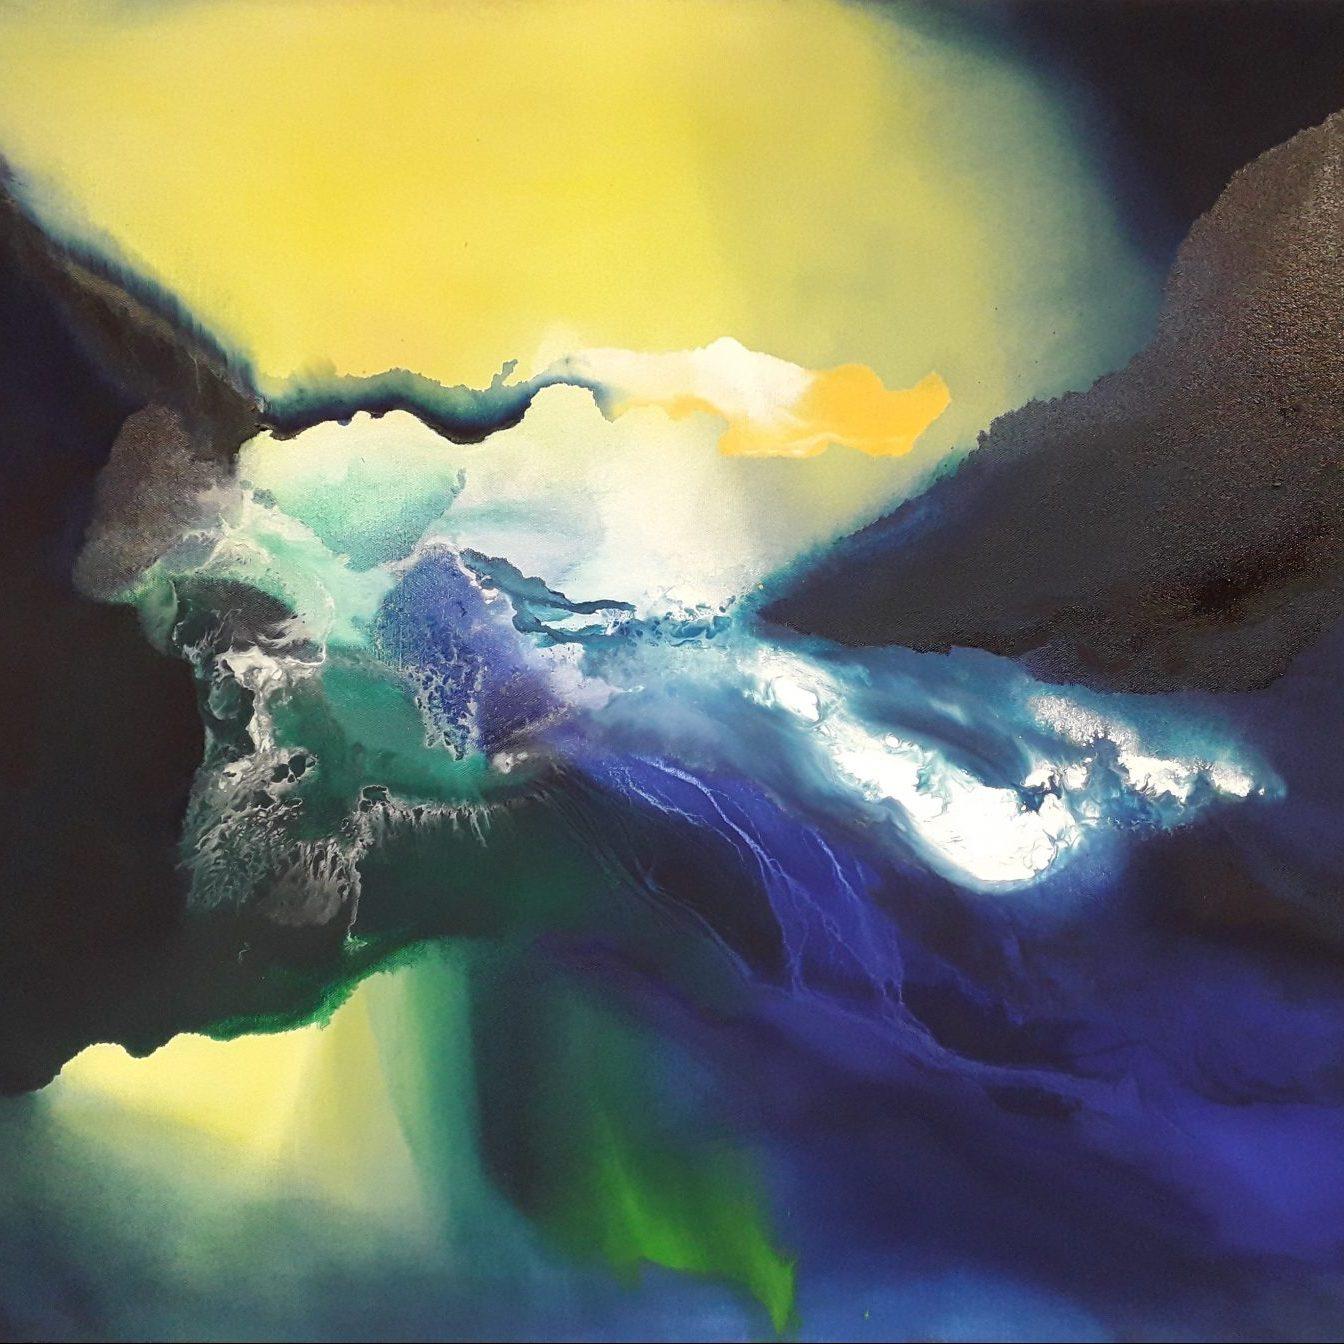 Brook 120x80cm oil on canvas by Kathryn Stevens